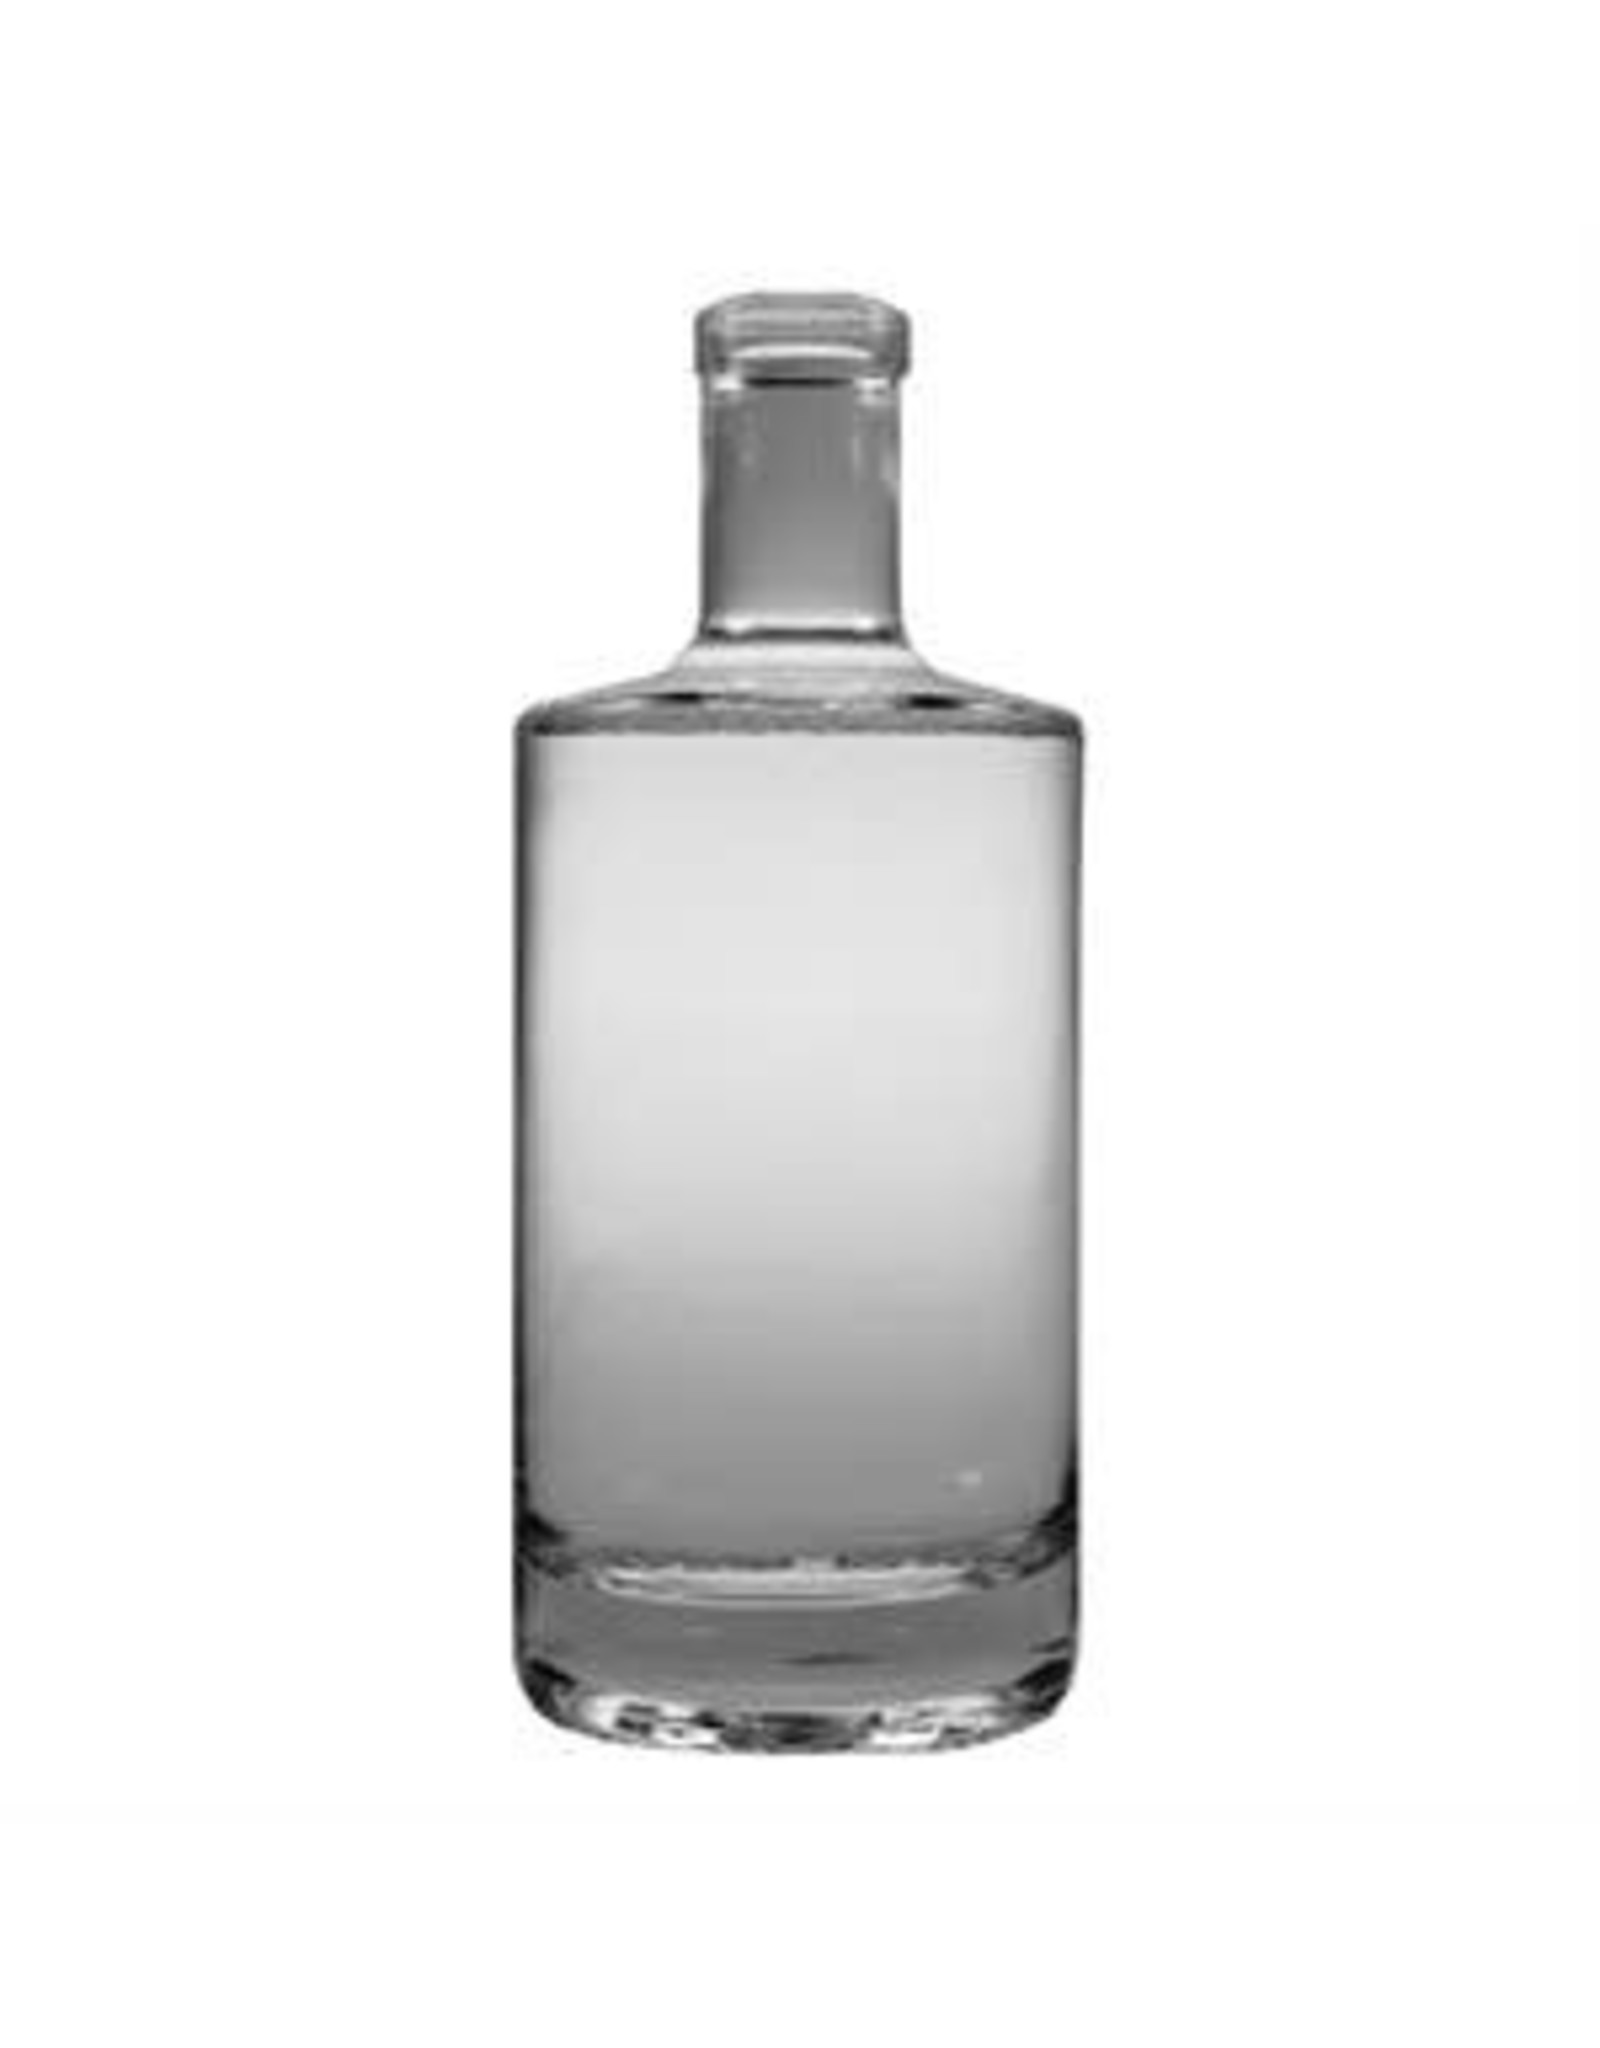 750 ml Flint Jersey Design Spirit Bottle Case/6